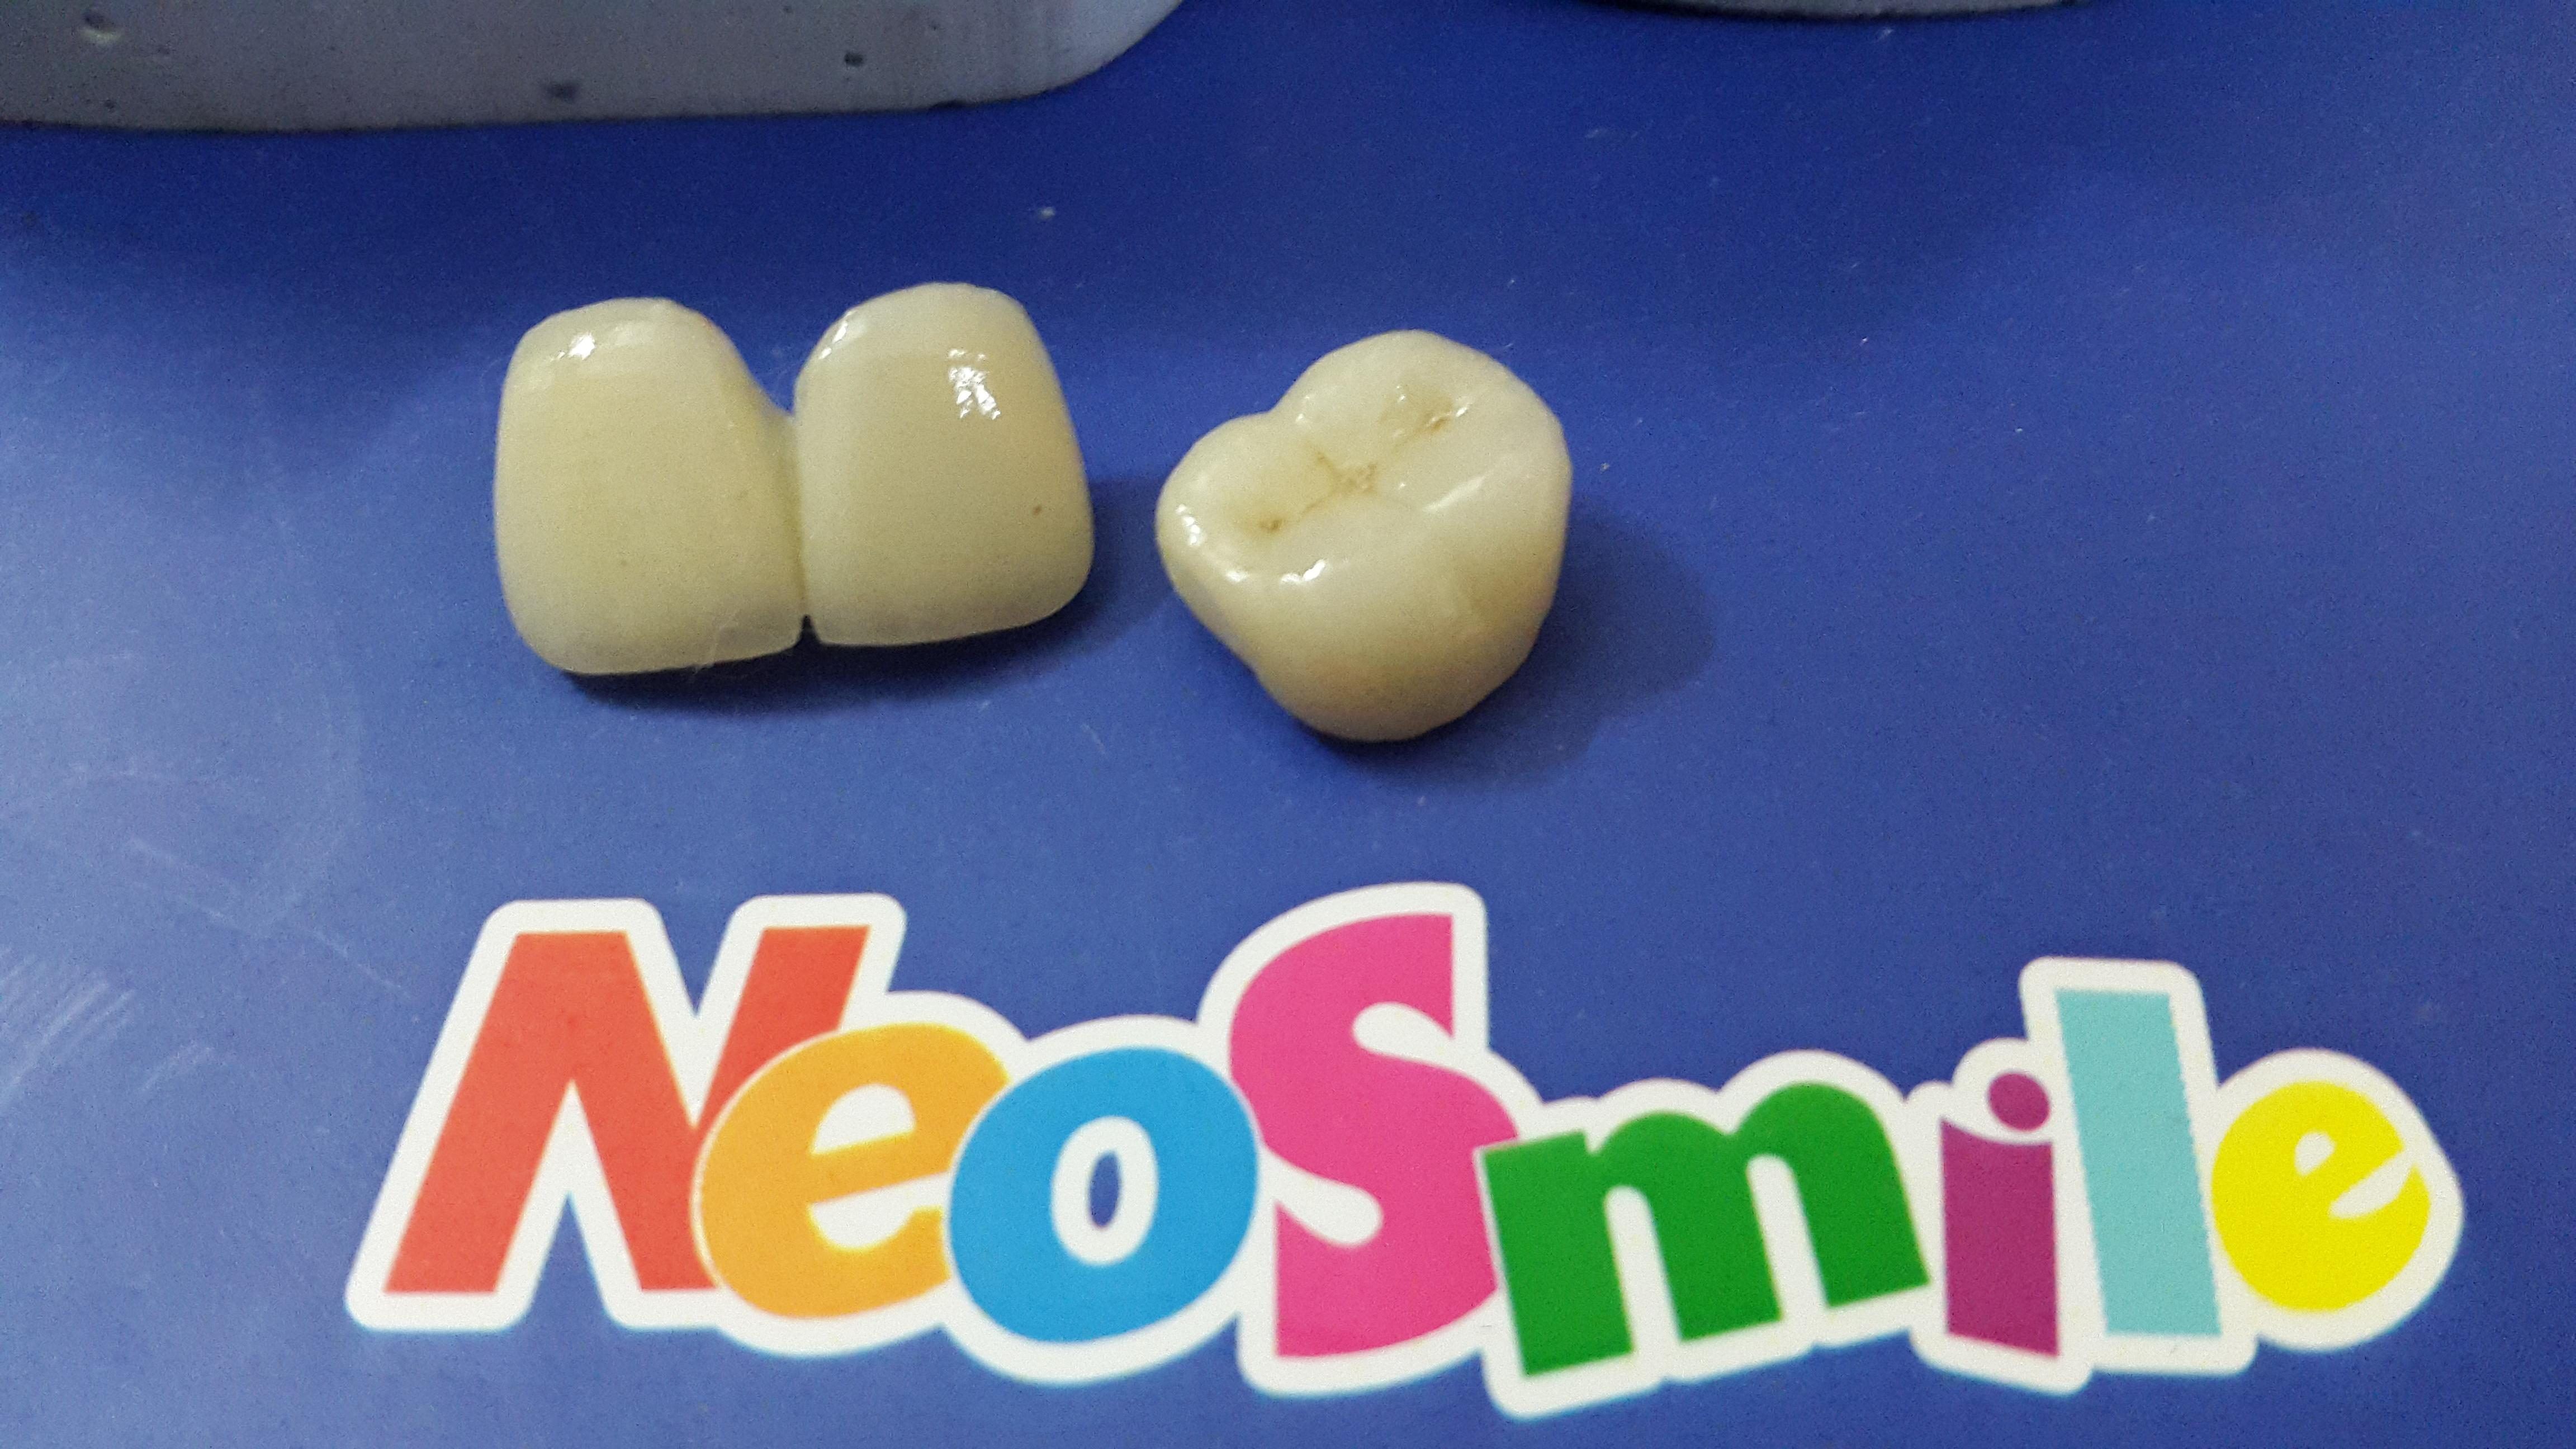 Neosmile Noida Centre for Dental Implants,Laser Dentistry & Invisible Orthodontics